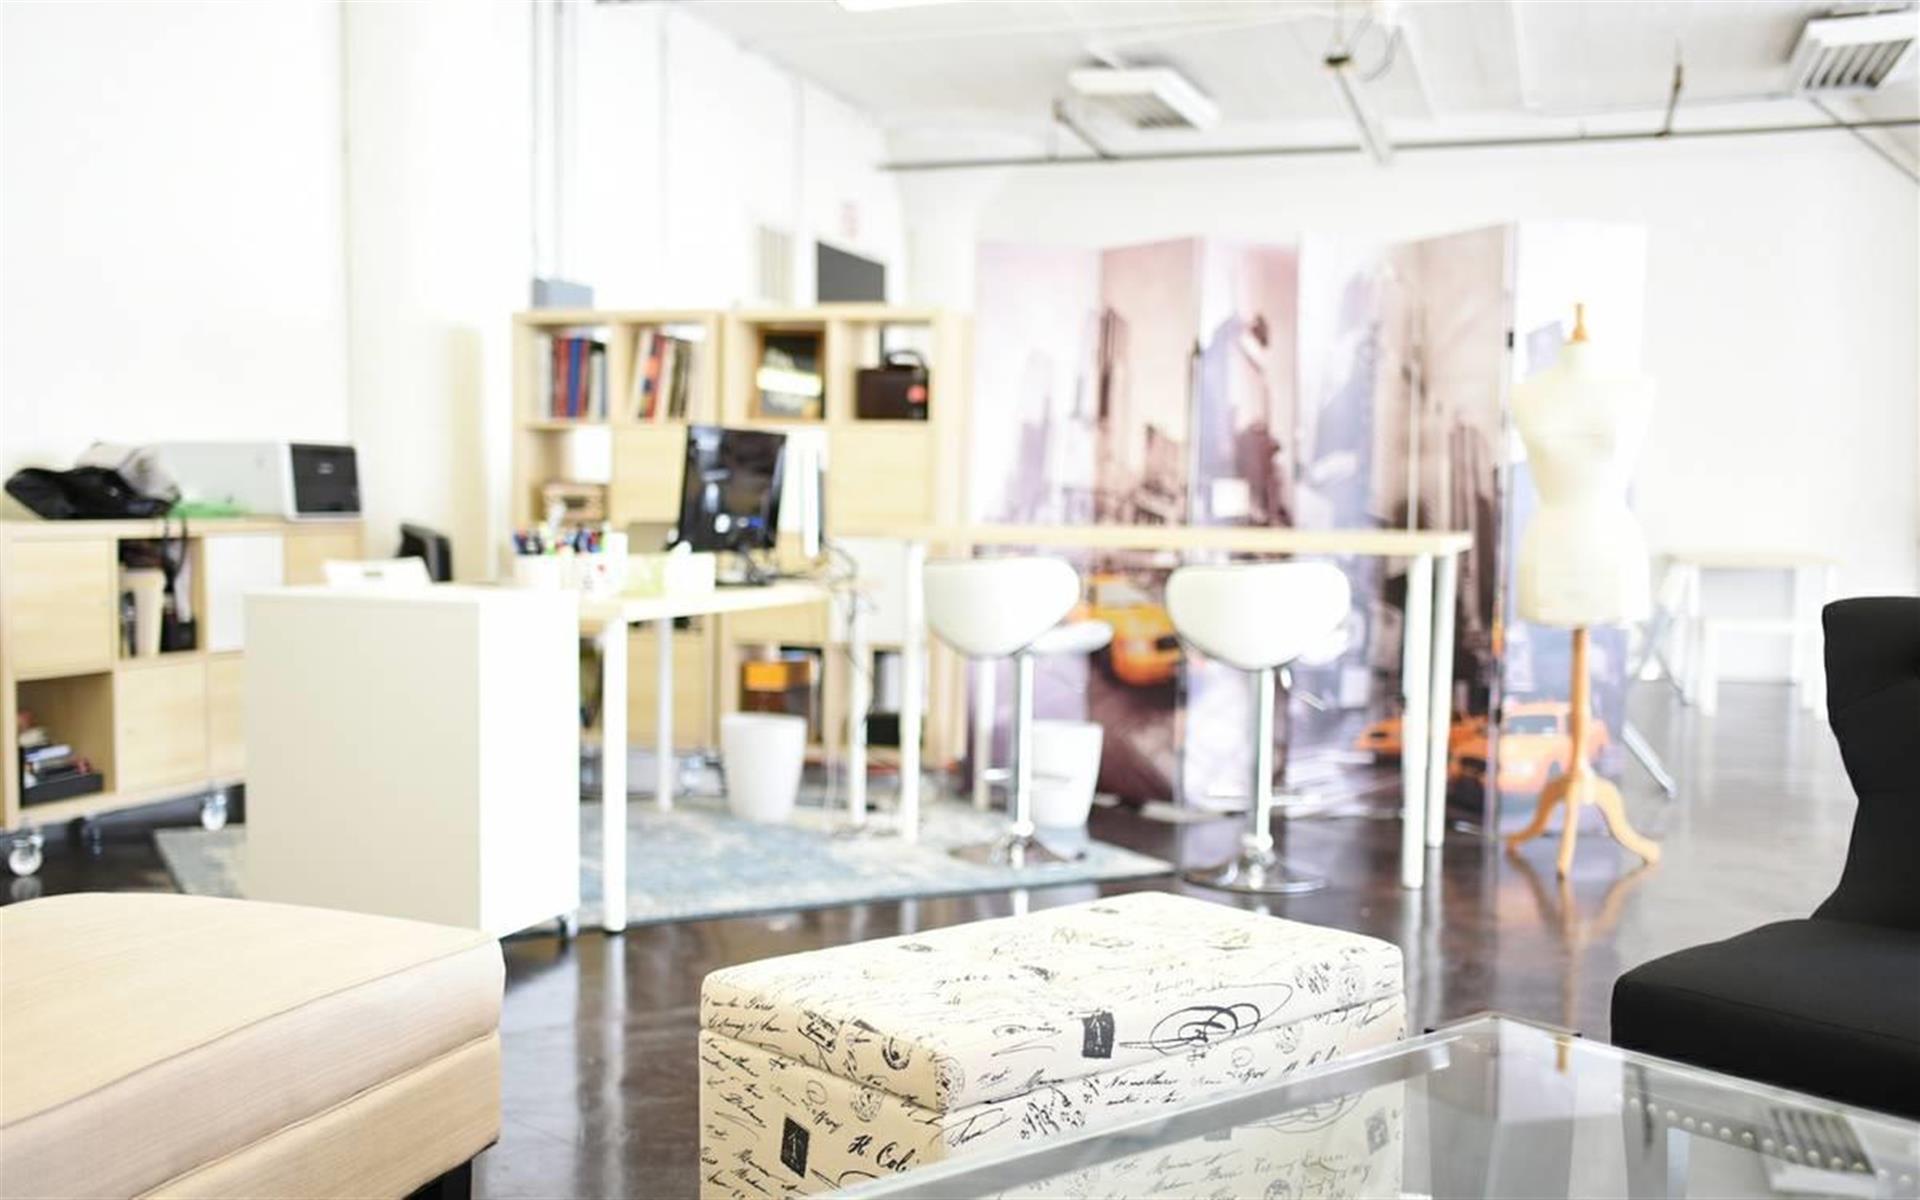 Ana Maria Kim - Dedicated Desk + $75/day for studio